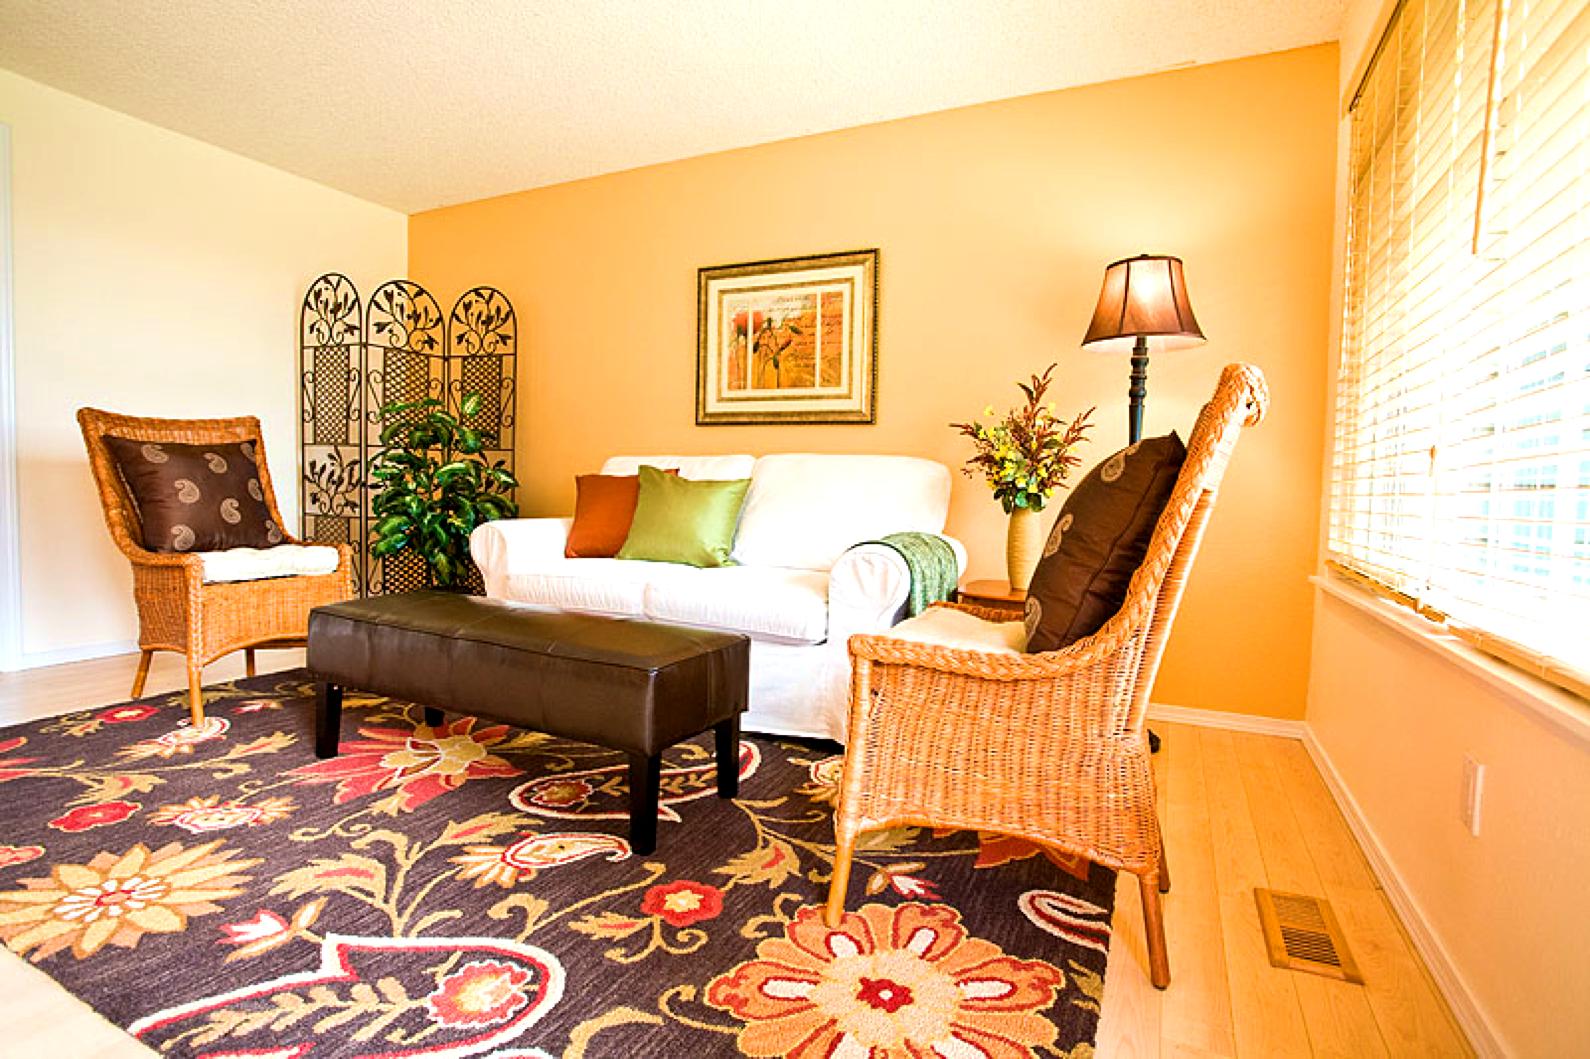 astonishing ideas for living room walls. Bedroom  Astonishing Ideas About Orange Rooms Room Decor Living